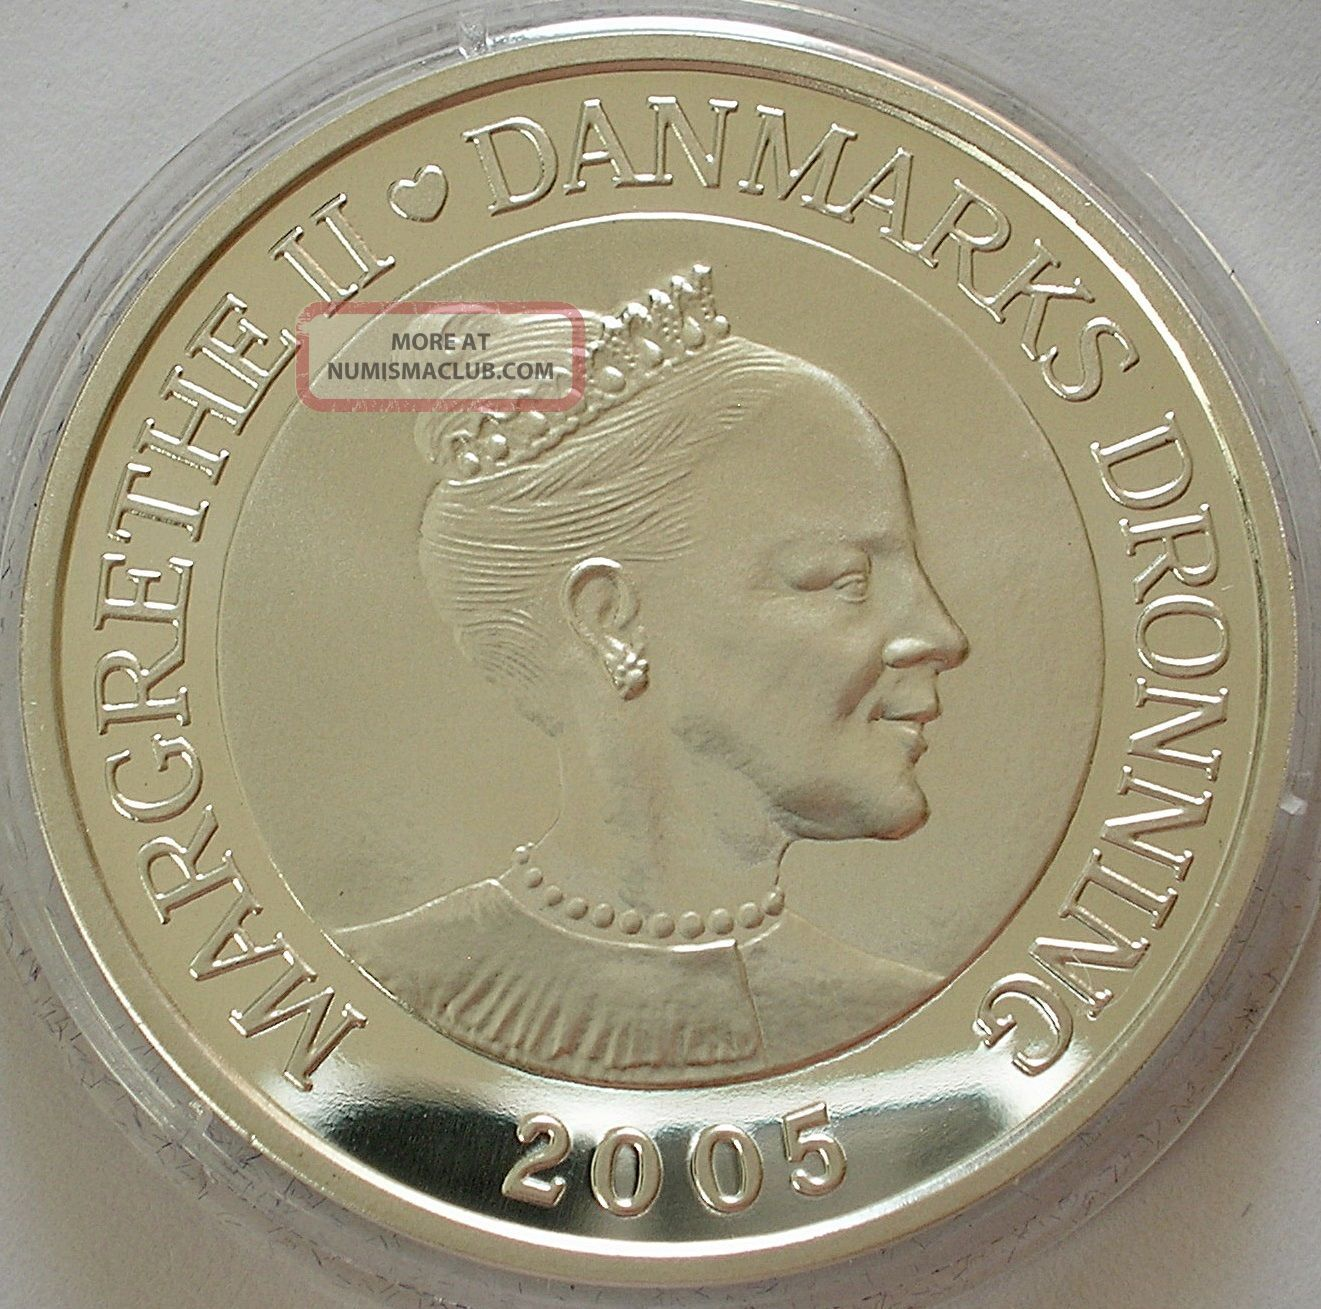 2005 Denmark 1oz Silver Proof 10 Kroner Coin Hans C